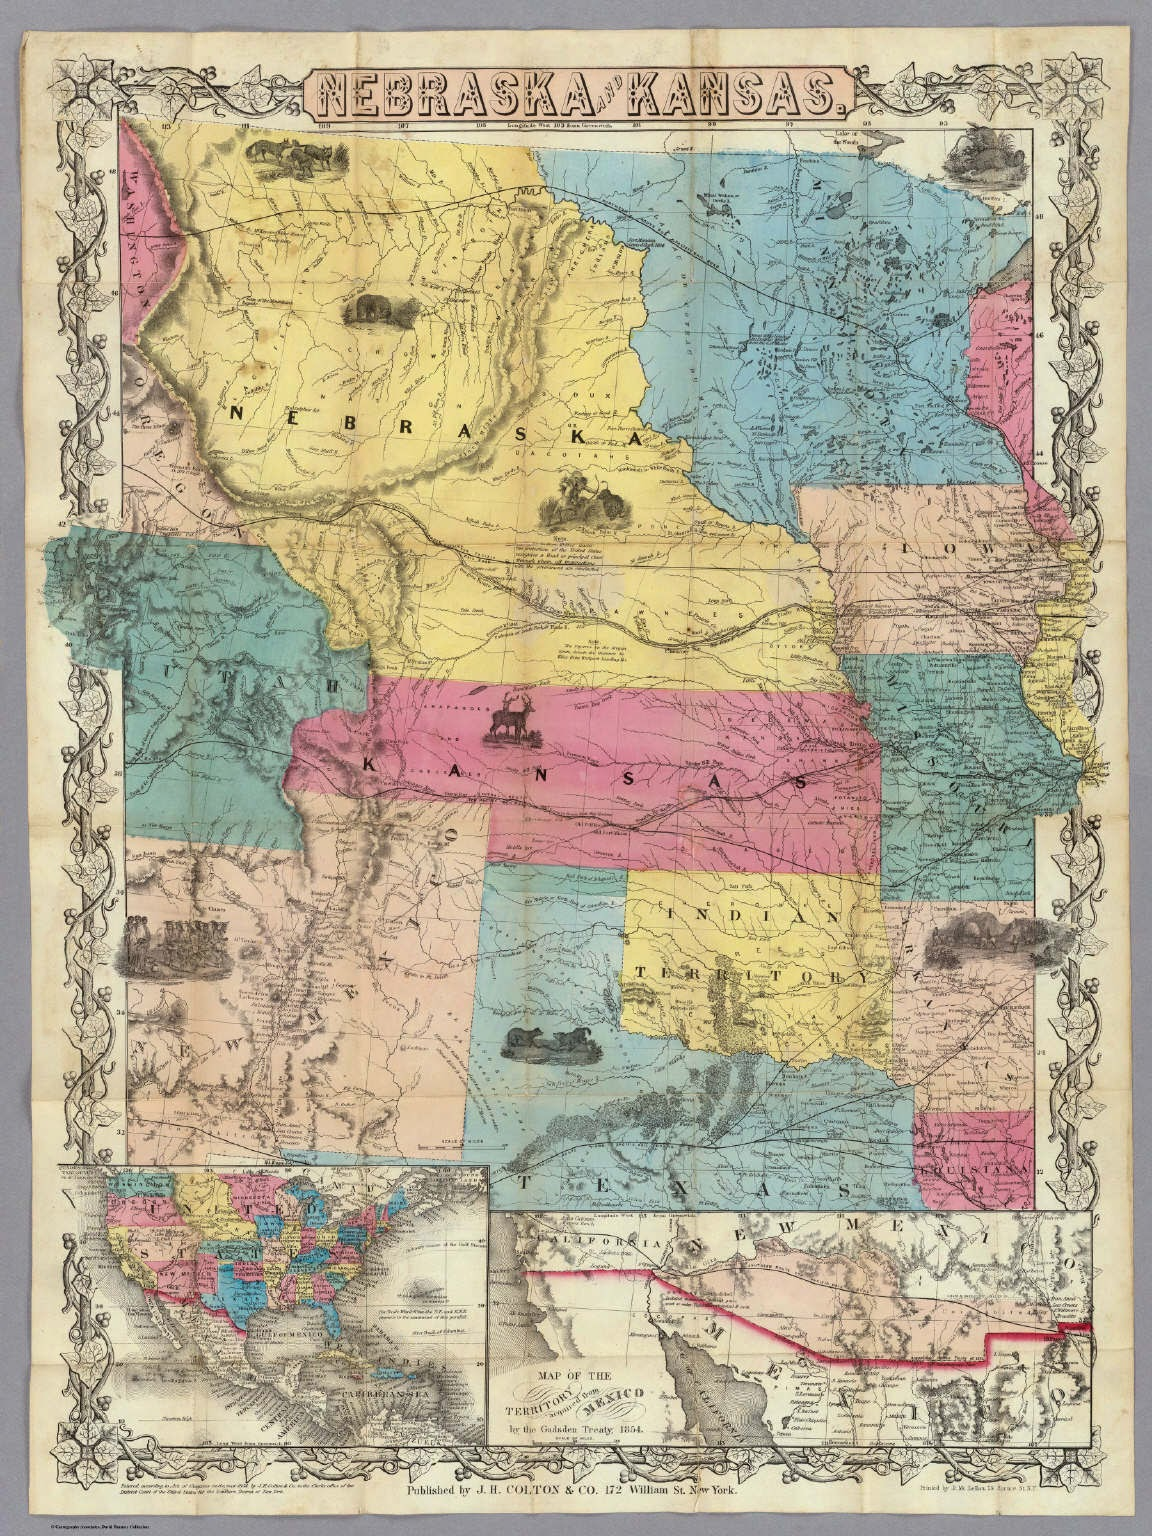 Antique Prints Blog The Origins Of The Nebraska Territory